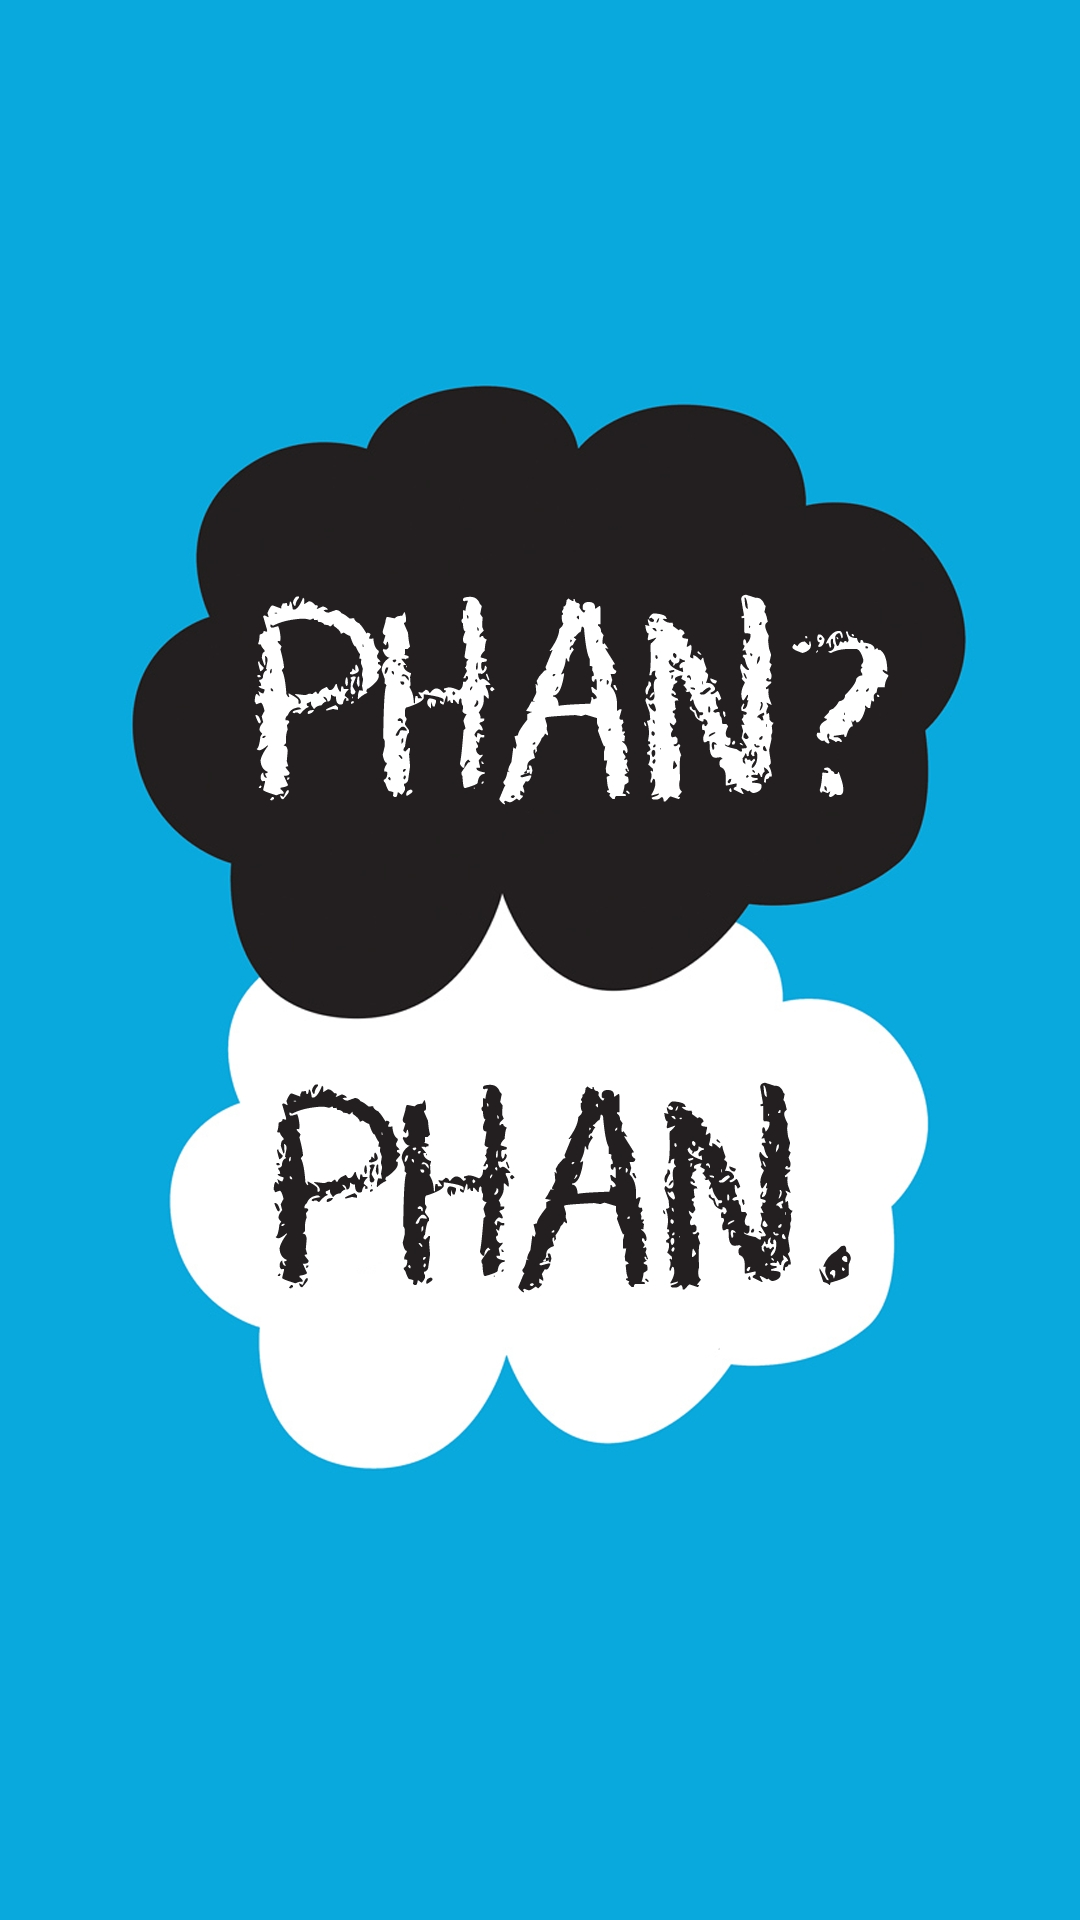 dan and phil wallpaper - google search   d&p   pinterest